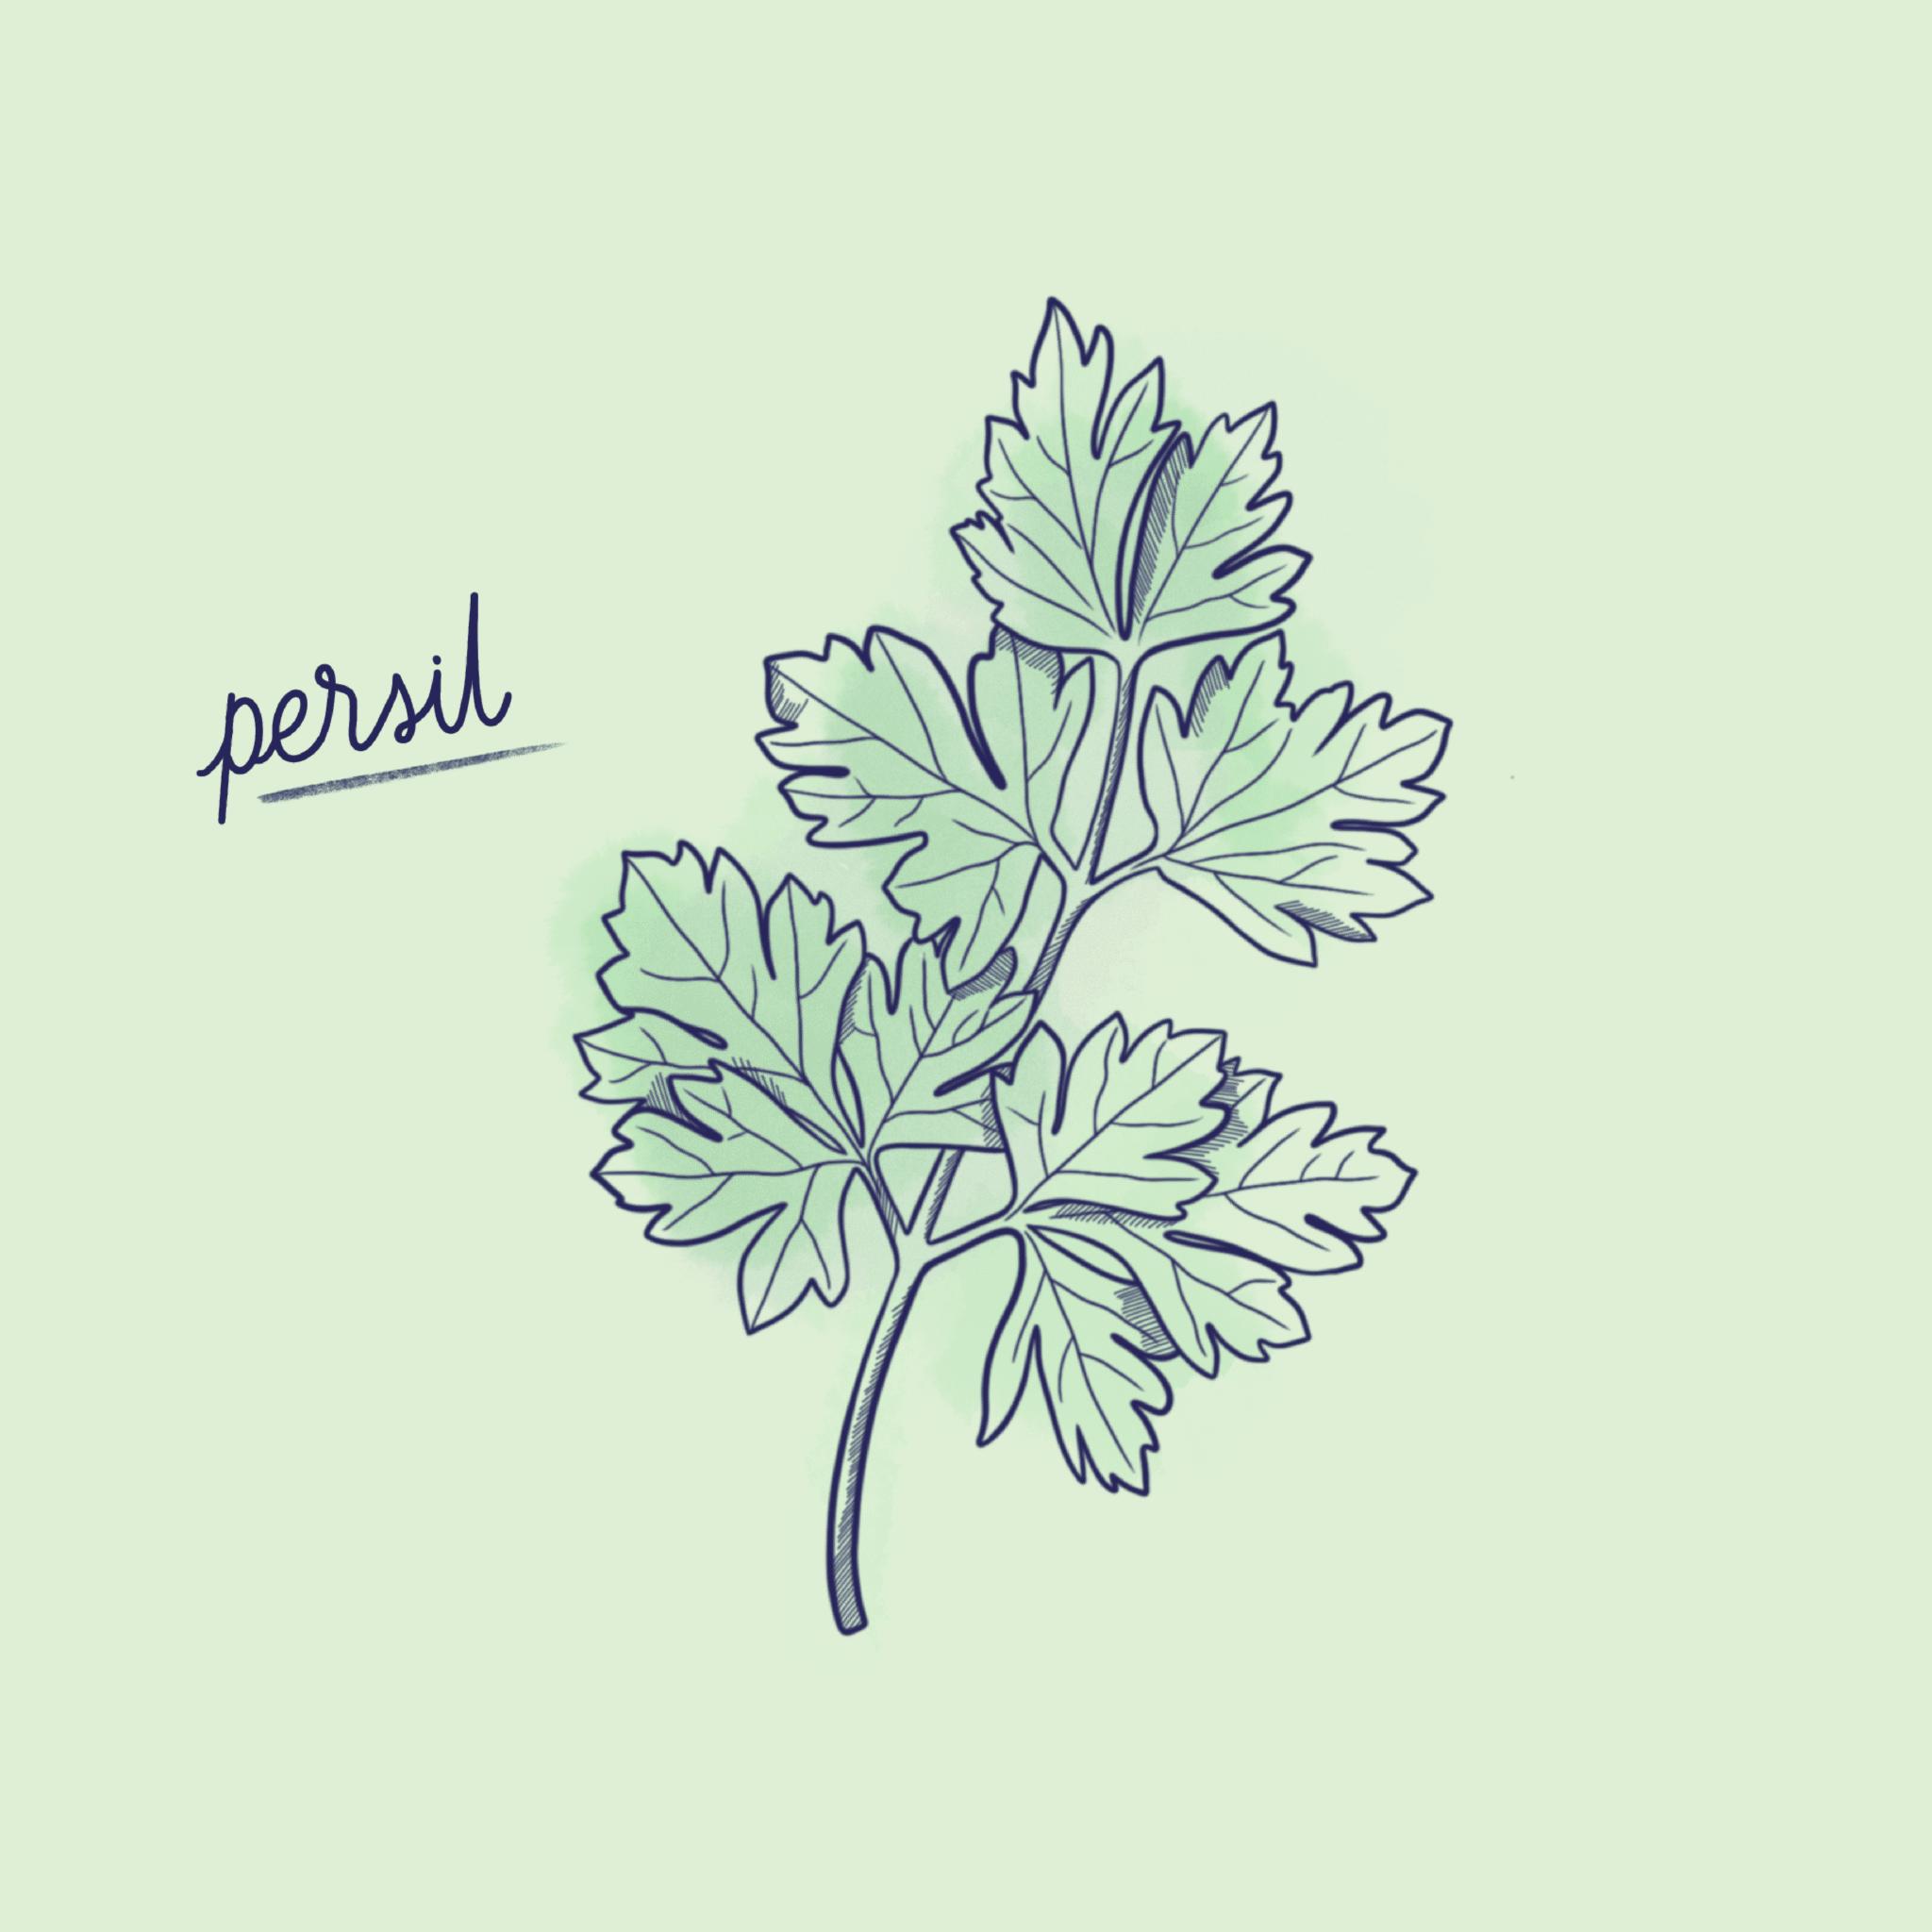 Persil_Légume-Post